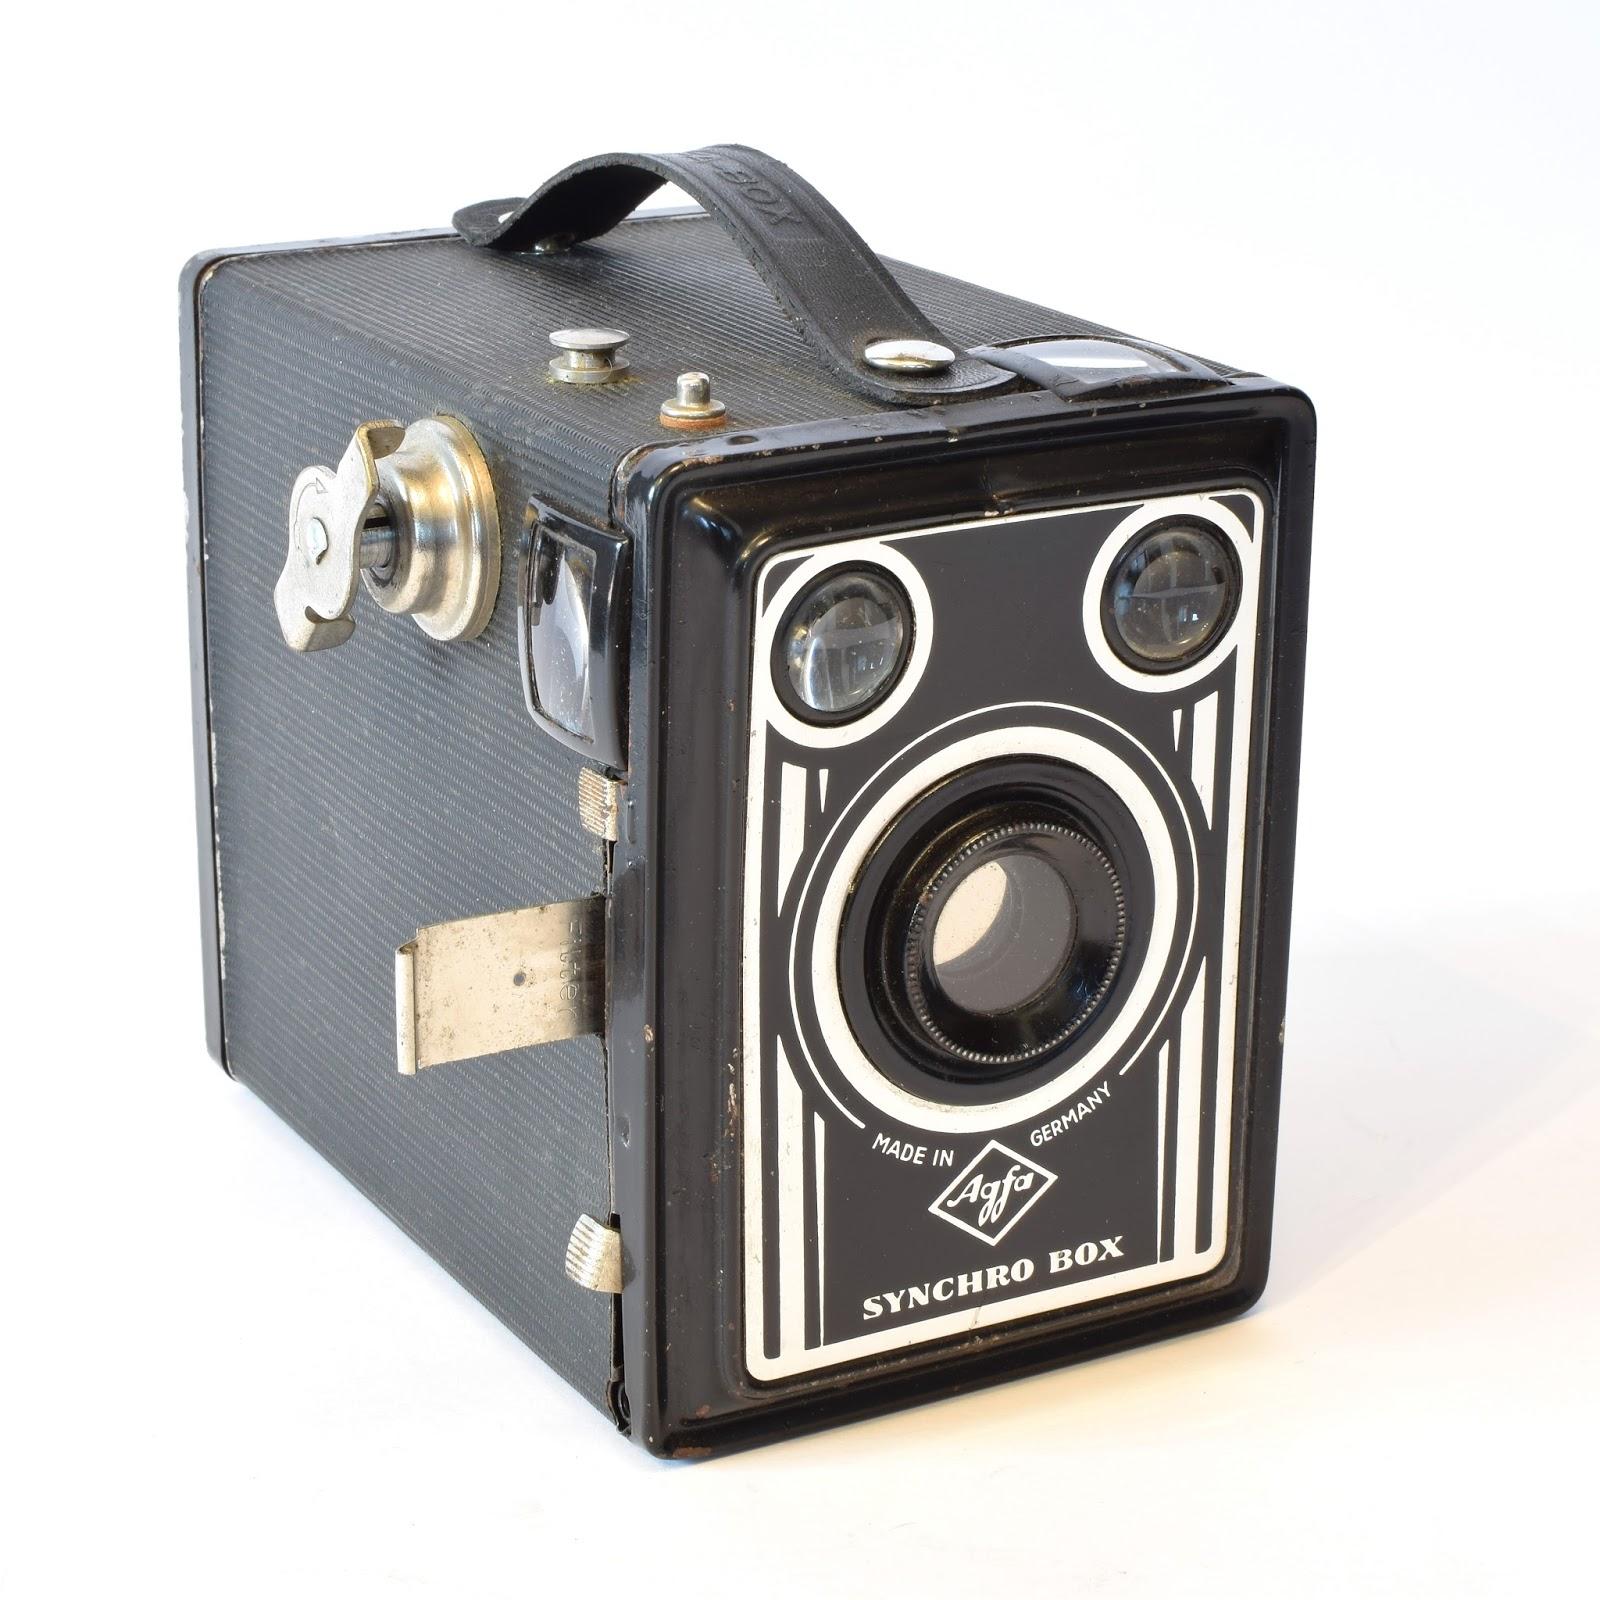 agfa synchro box 600 1951 vintage cameras collection rh vintagecamerascollection blogspot com